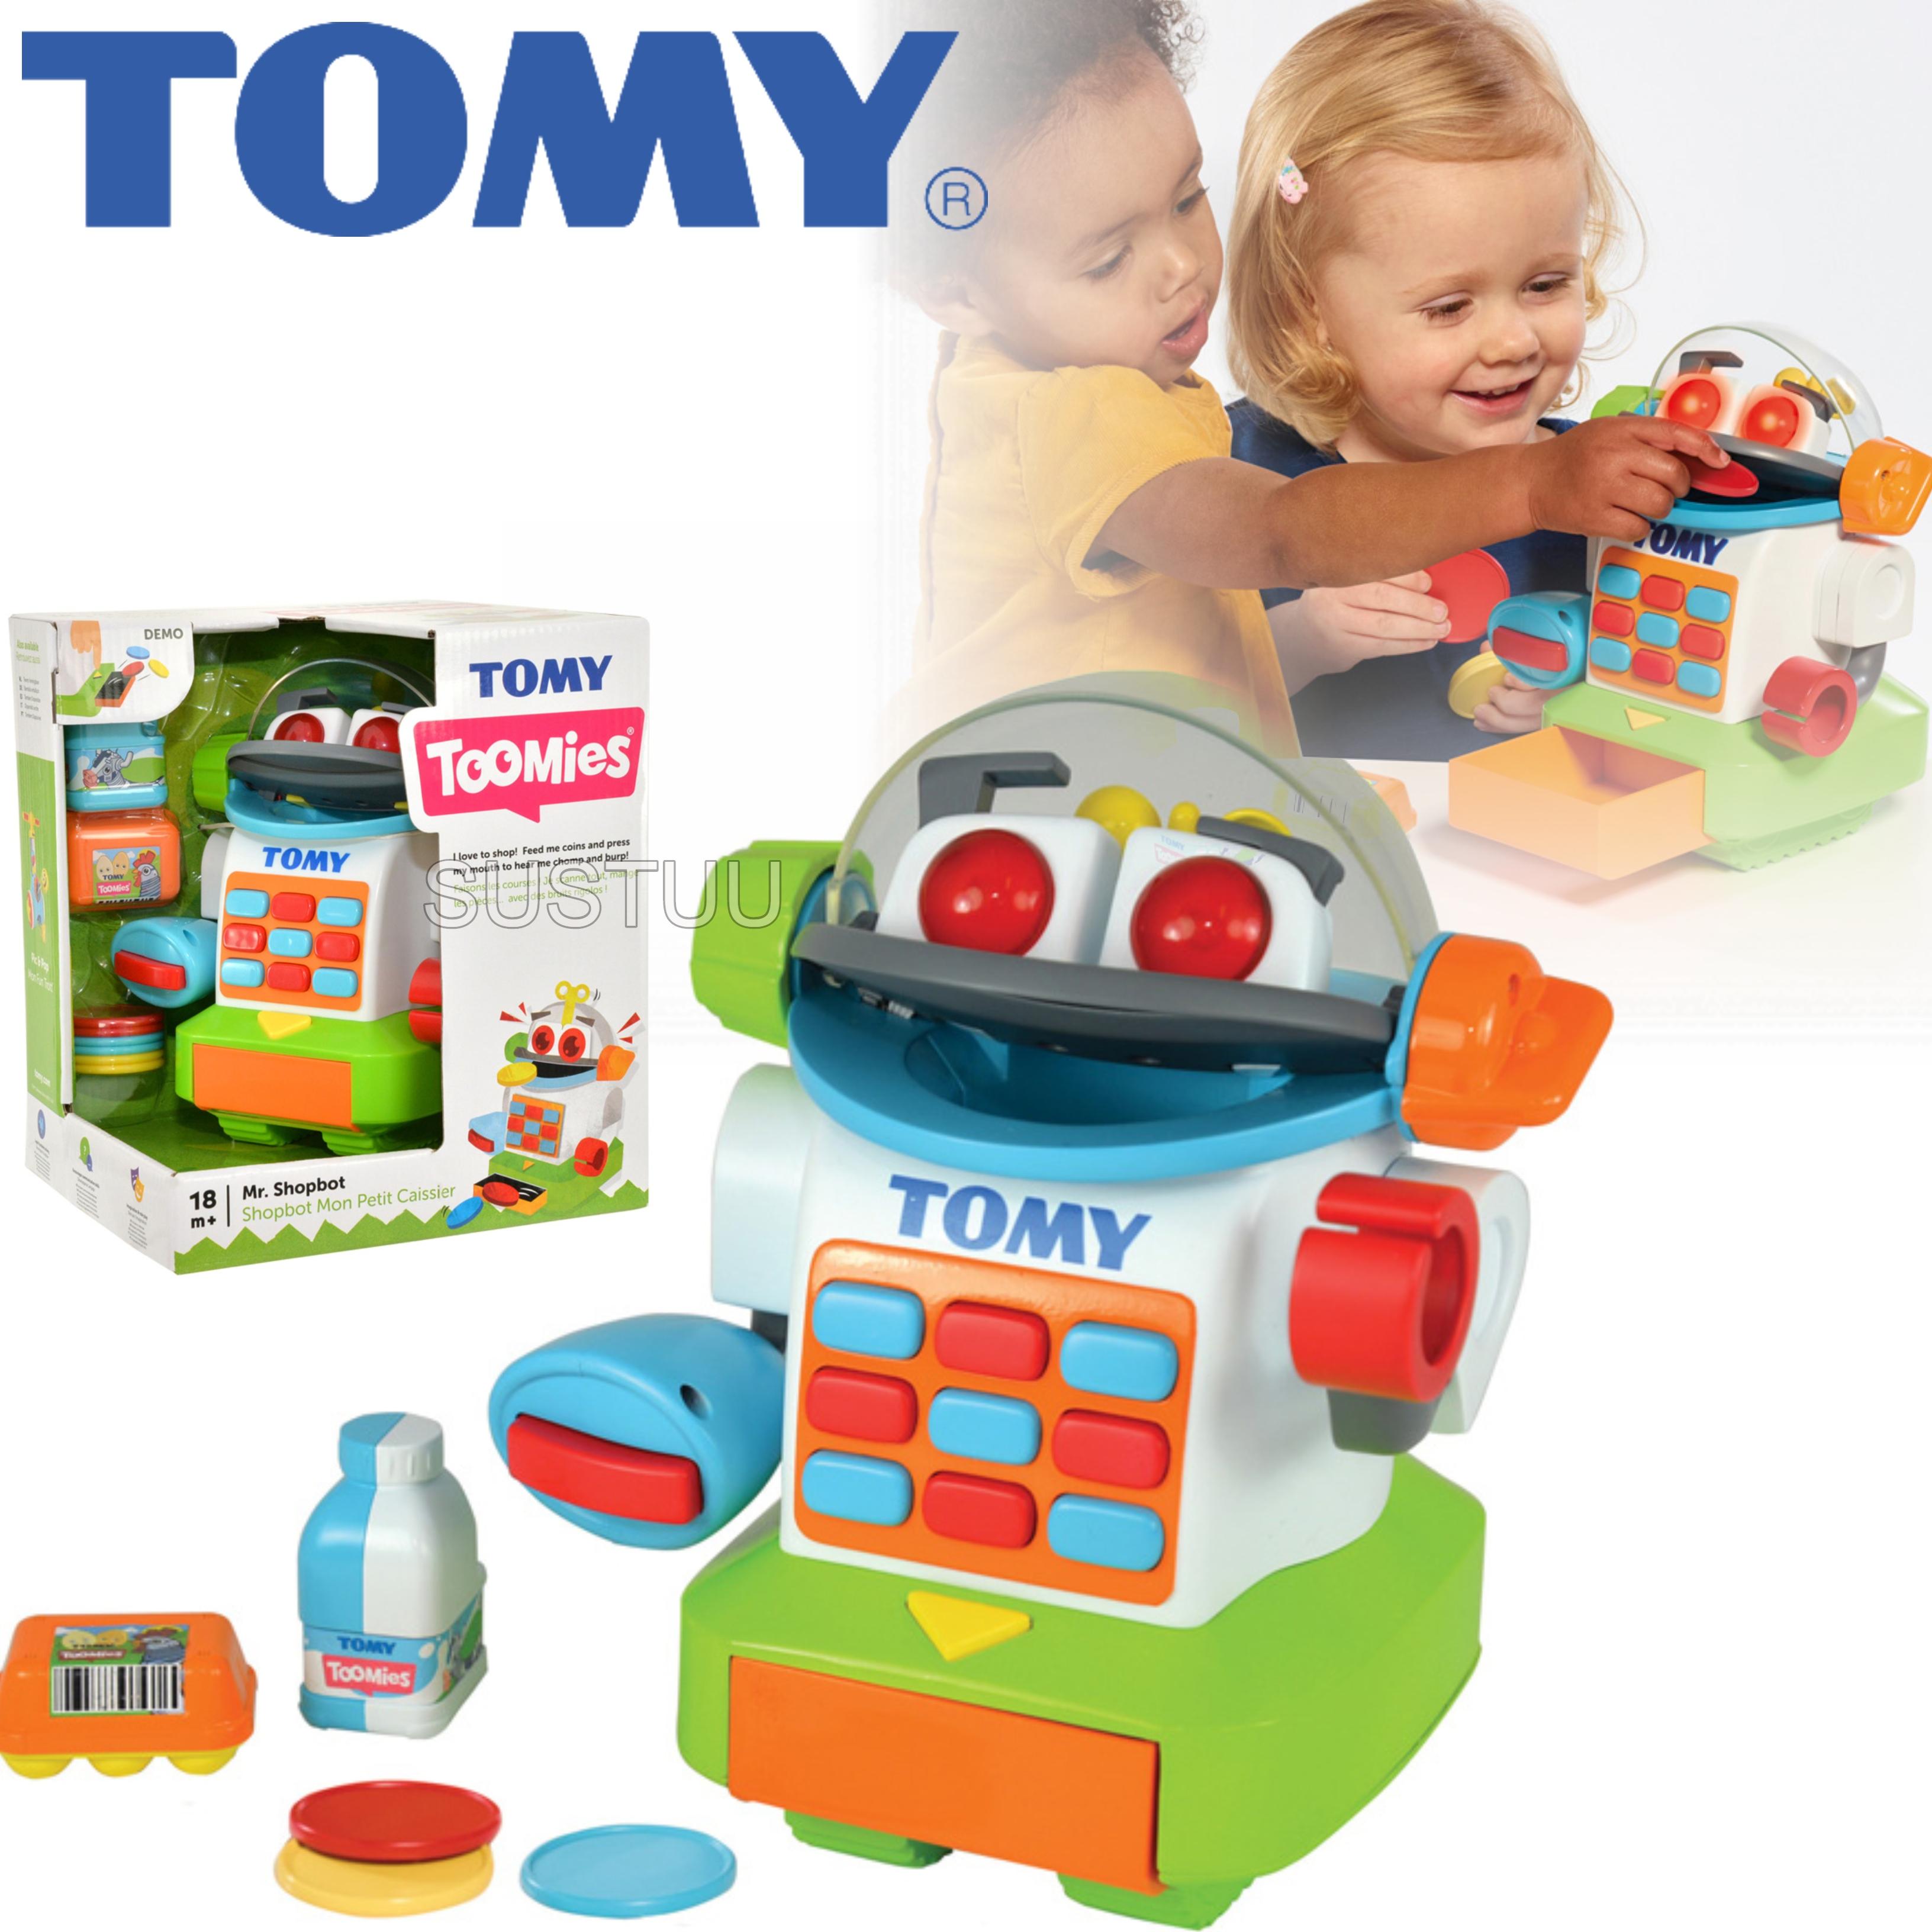 Tomy Mr. Shopbot?Preschool Kids Learing Activity Fun Toy | Coins+Bottle+Egg Carton